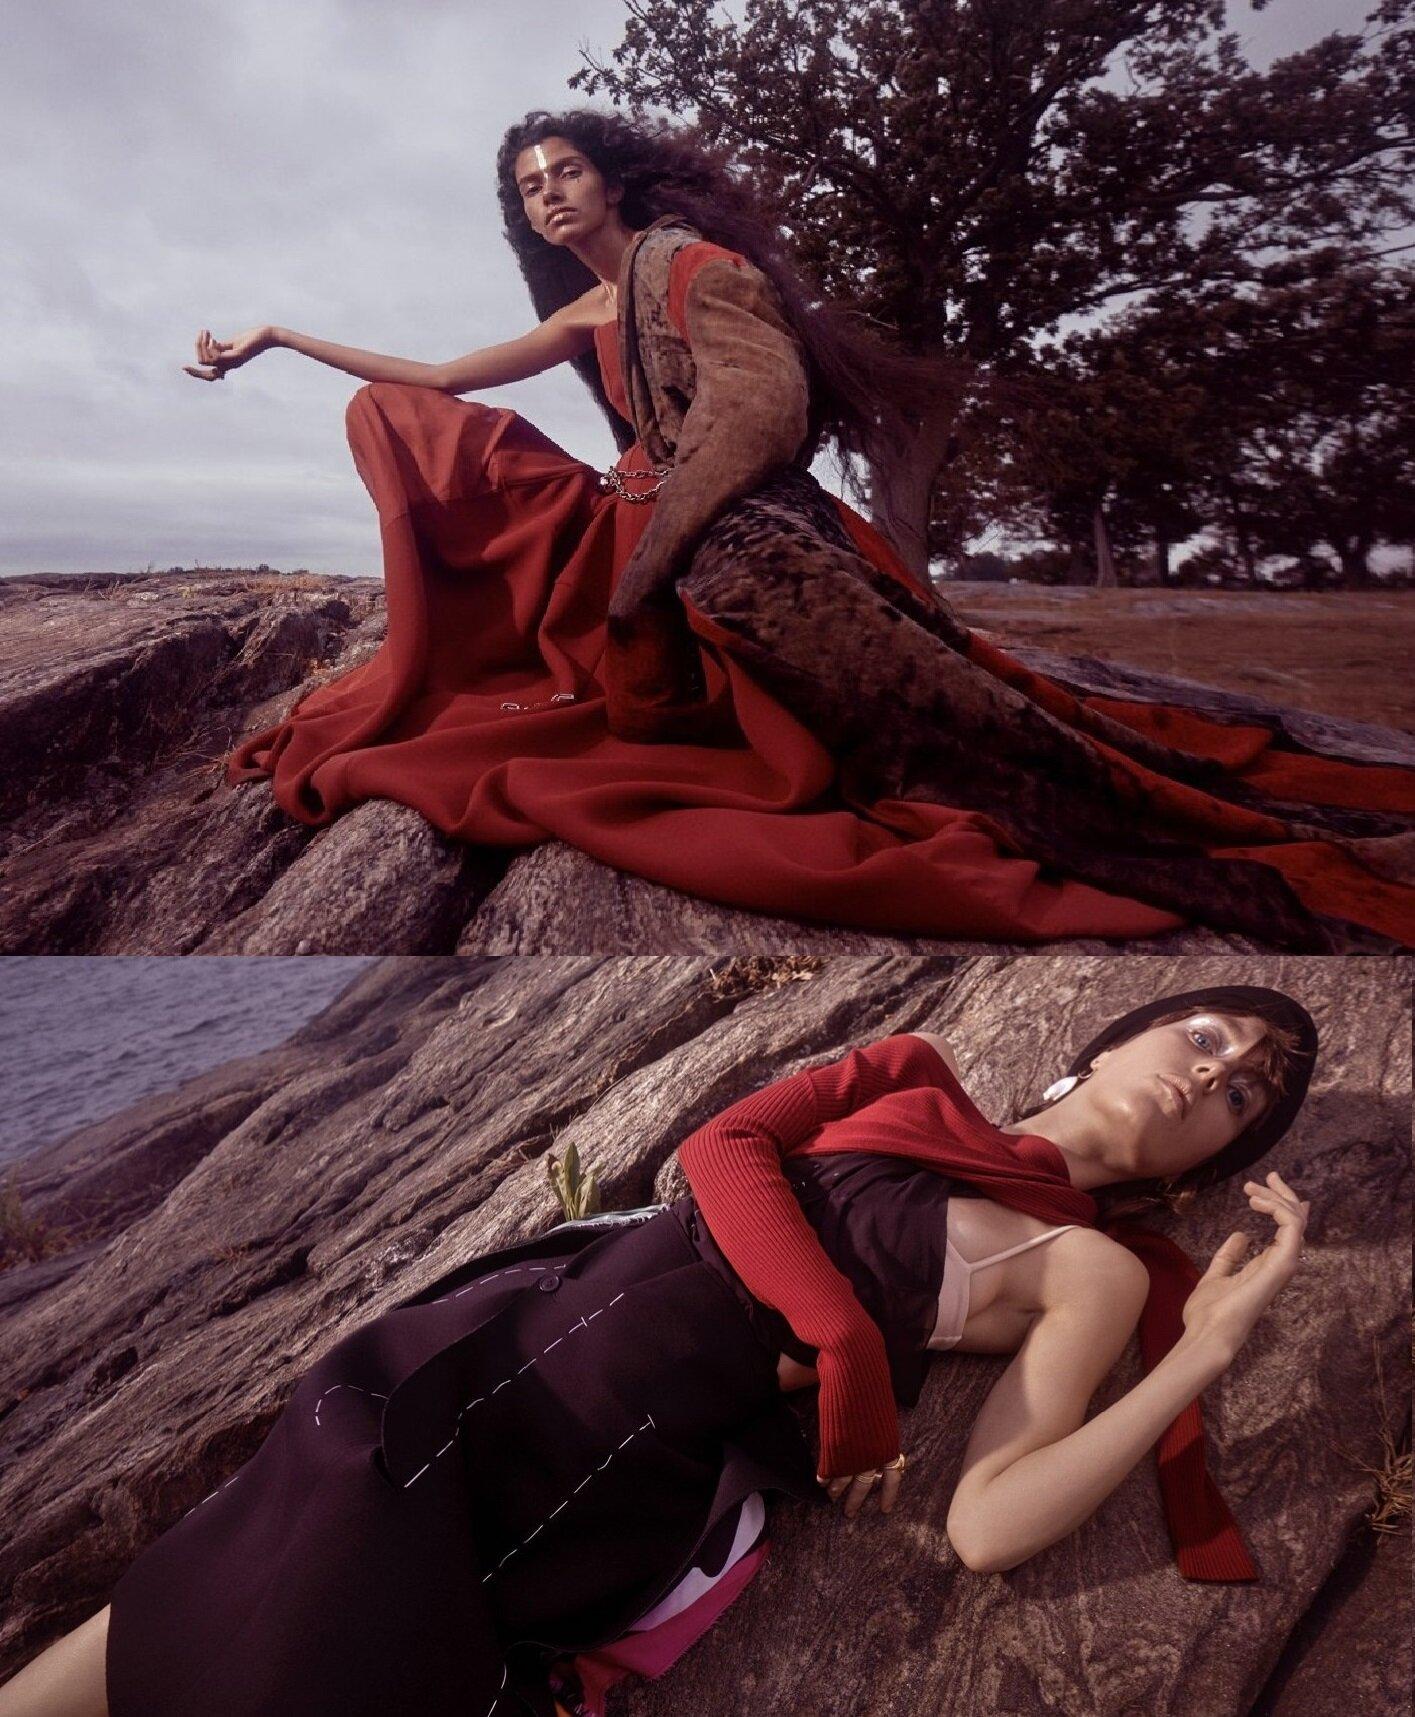 Emma Summerton shoots 'To New Shore' for Emma Summerton in Vogue Germany Nov 2019 (2) duo.jpg